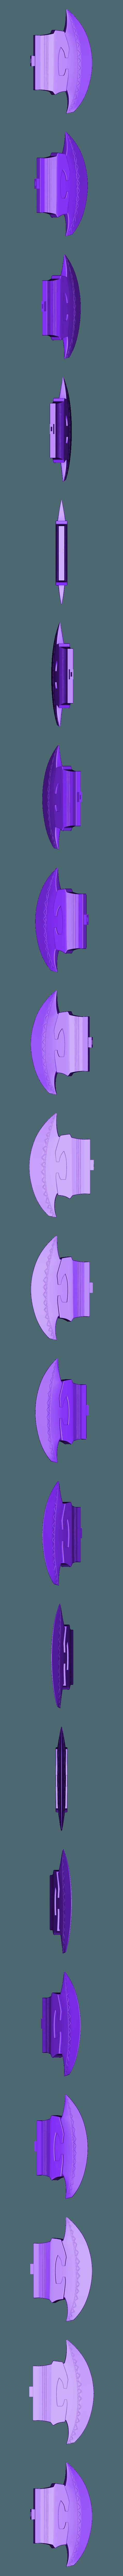 Part2.stl Download OBJ file AXE-Warhammer • Object to 3D print, Bstar3Dart